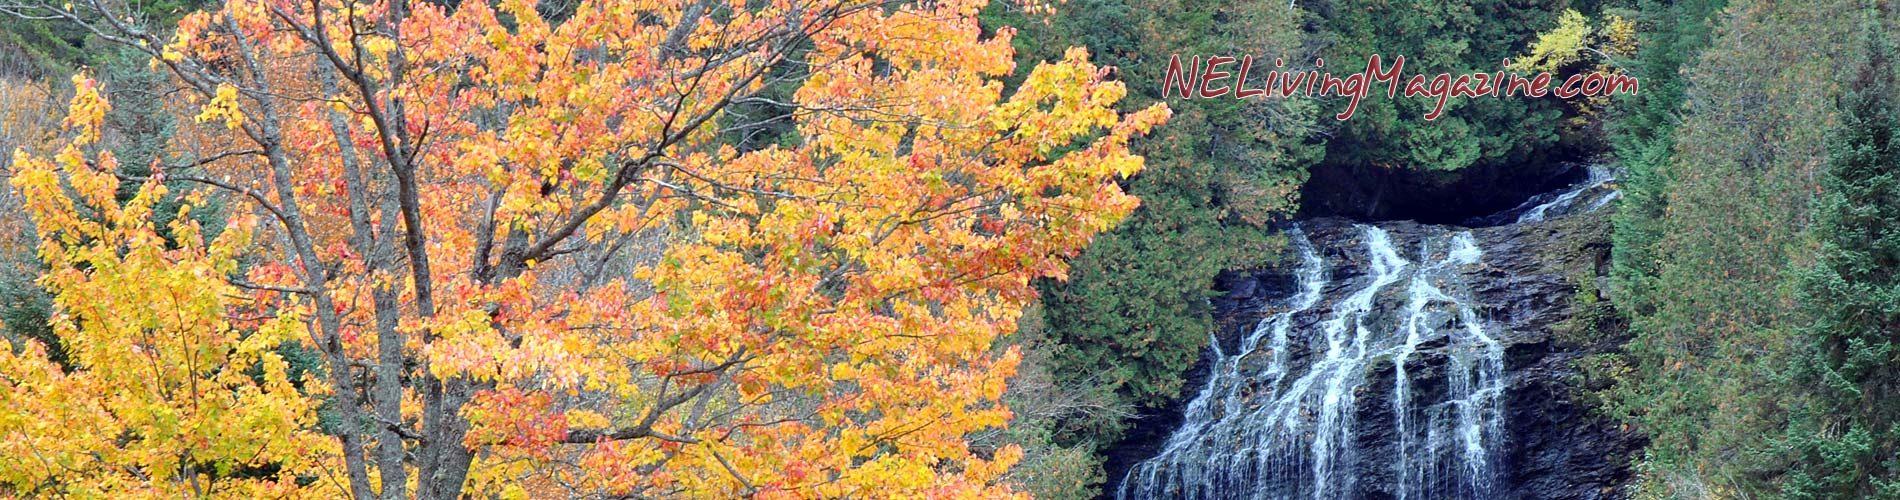 New England Fall Foliage Vacations